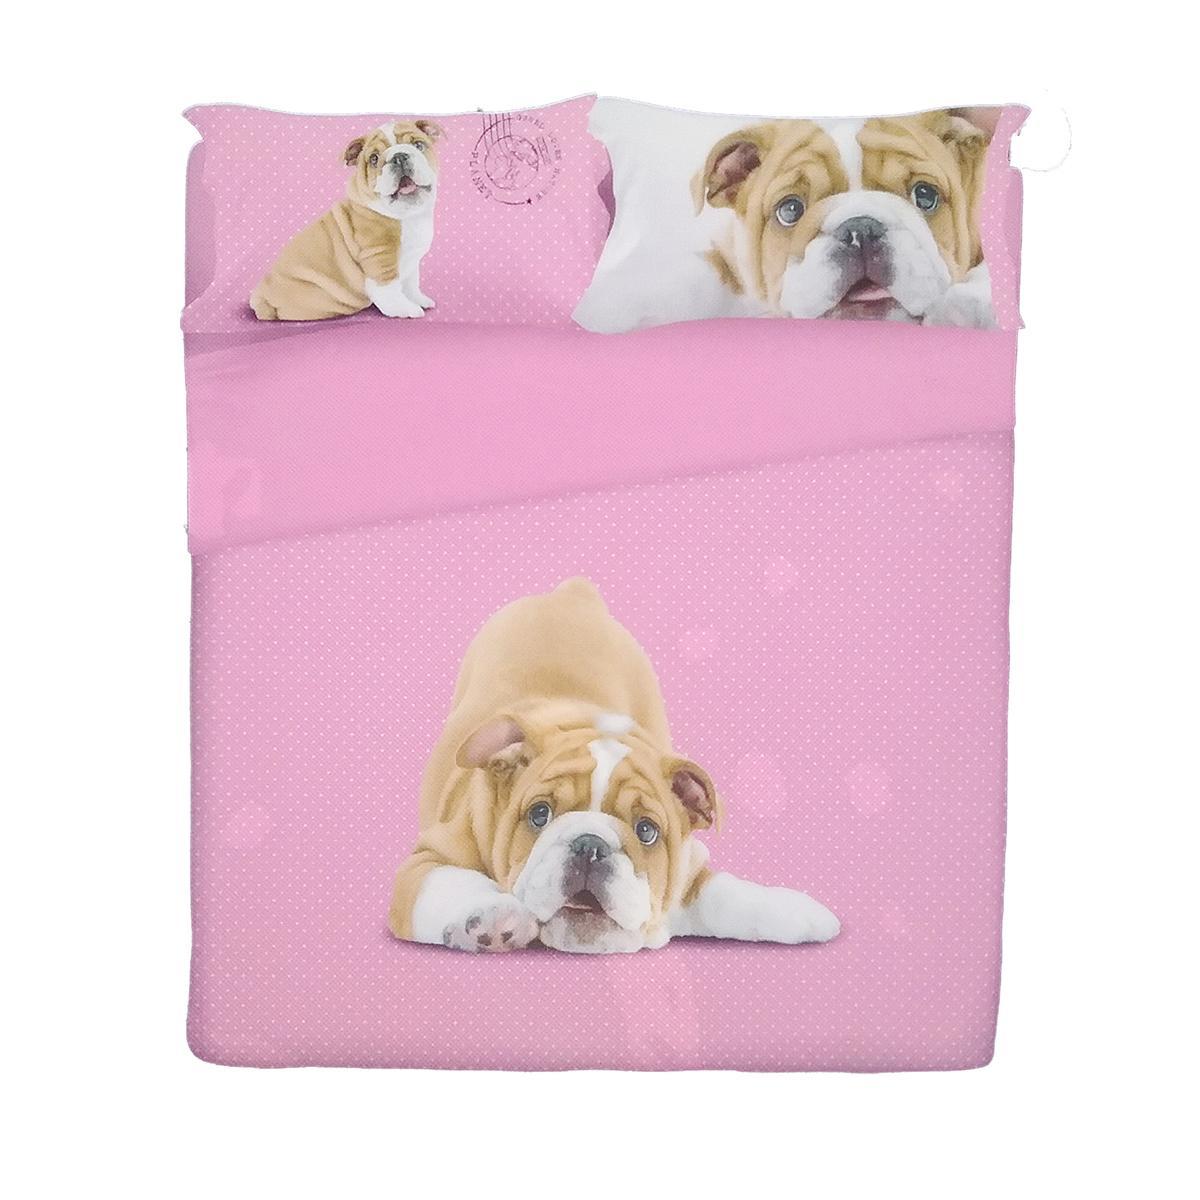 Completo lenzuola letto 2 piazze matrimoniale grrr cane by - Piumini leggeri letto ...